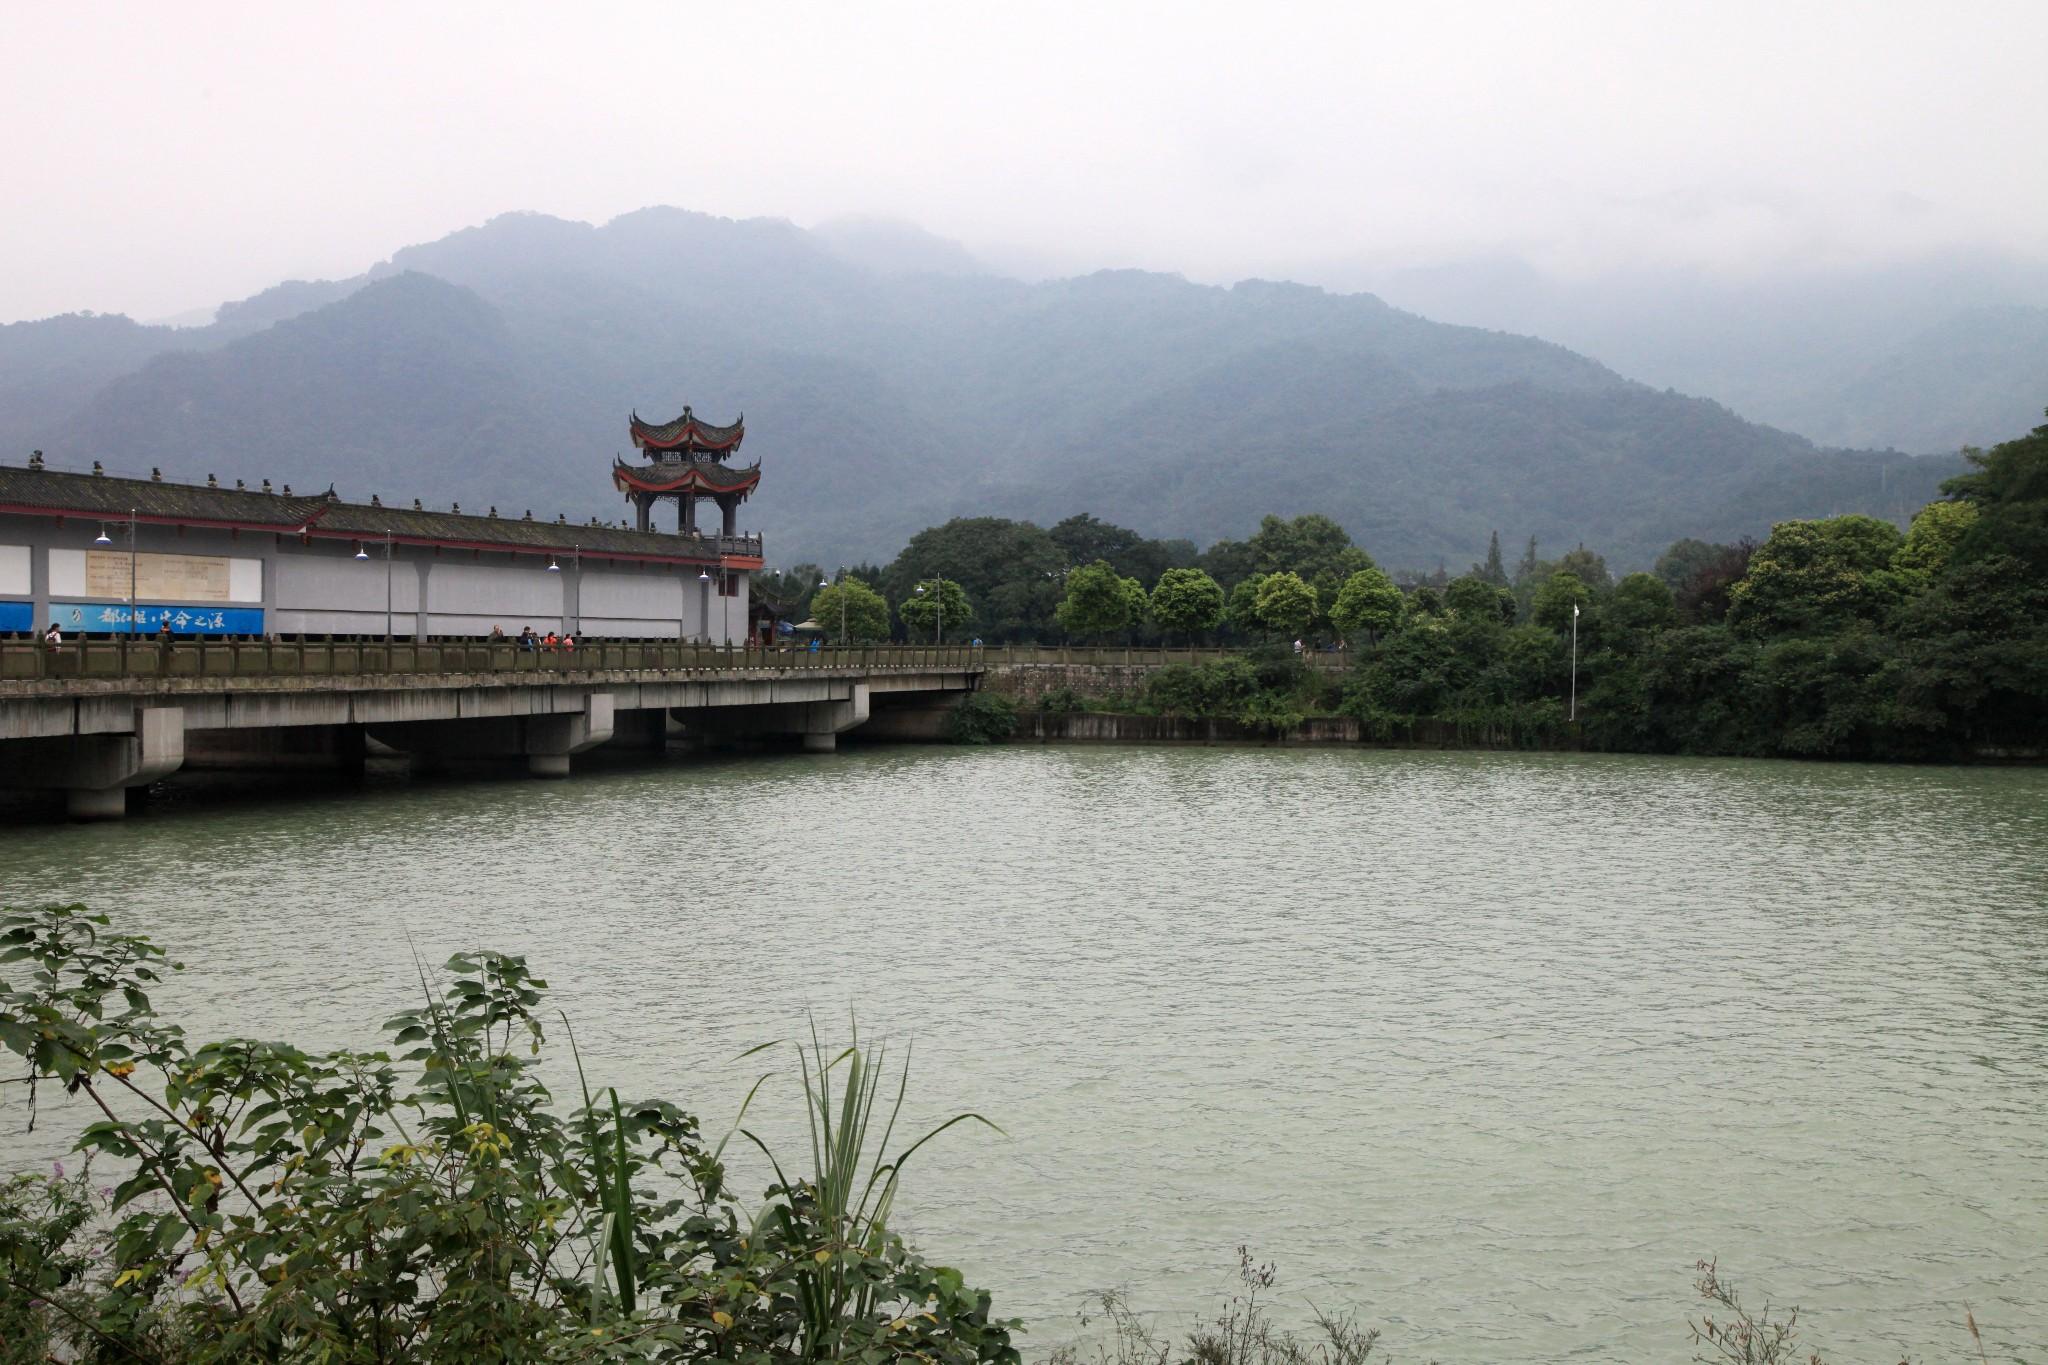 Dujiangyan Irrigation System Tour